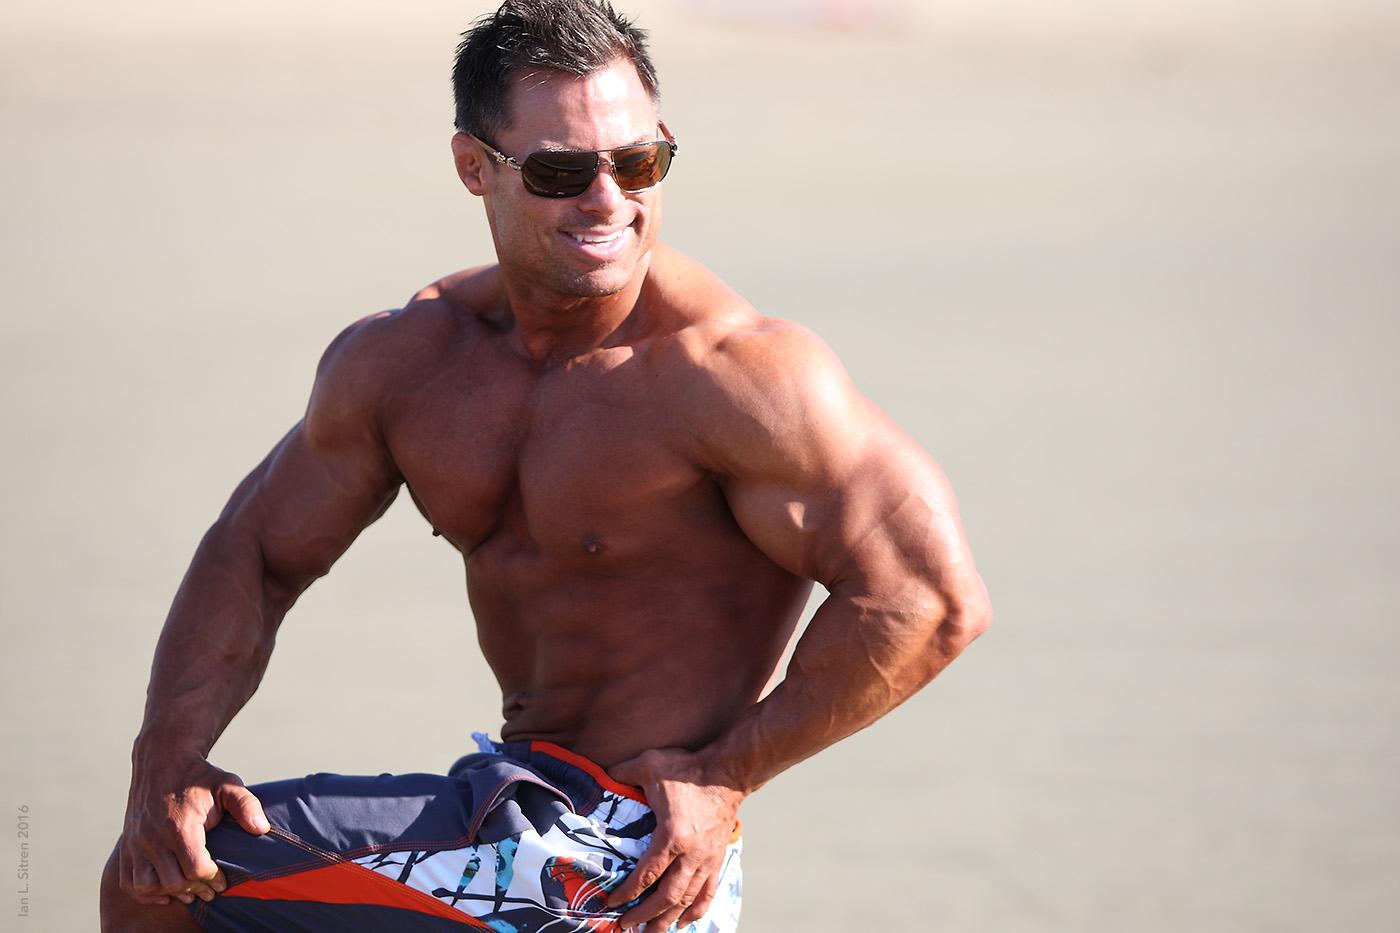 Jake Sawyer on the beach in Marina Del Rey California